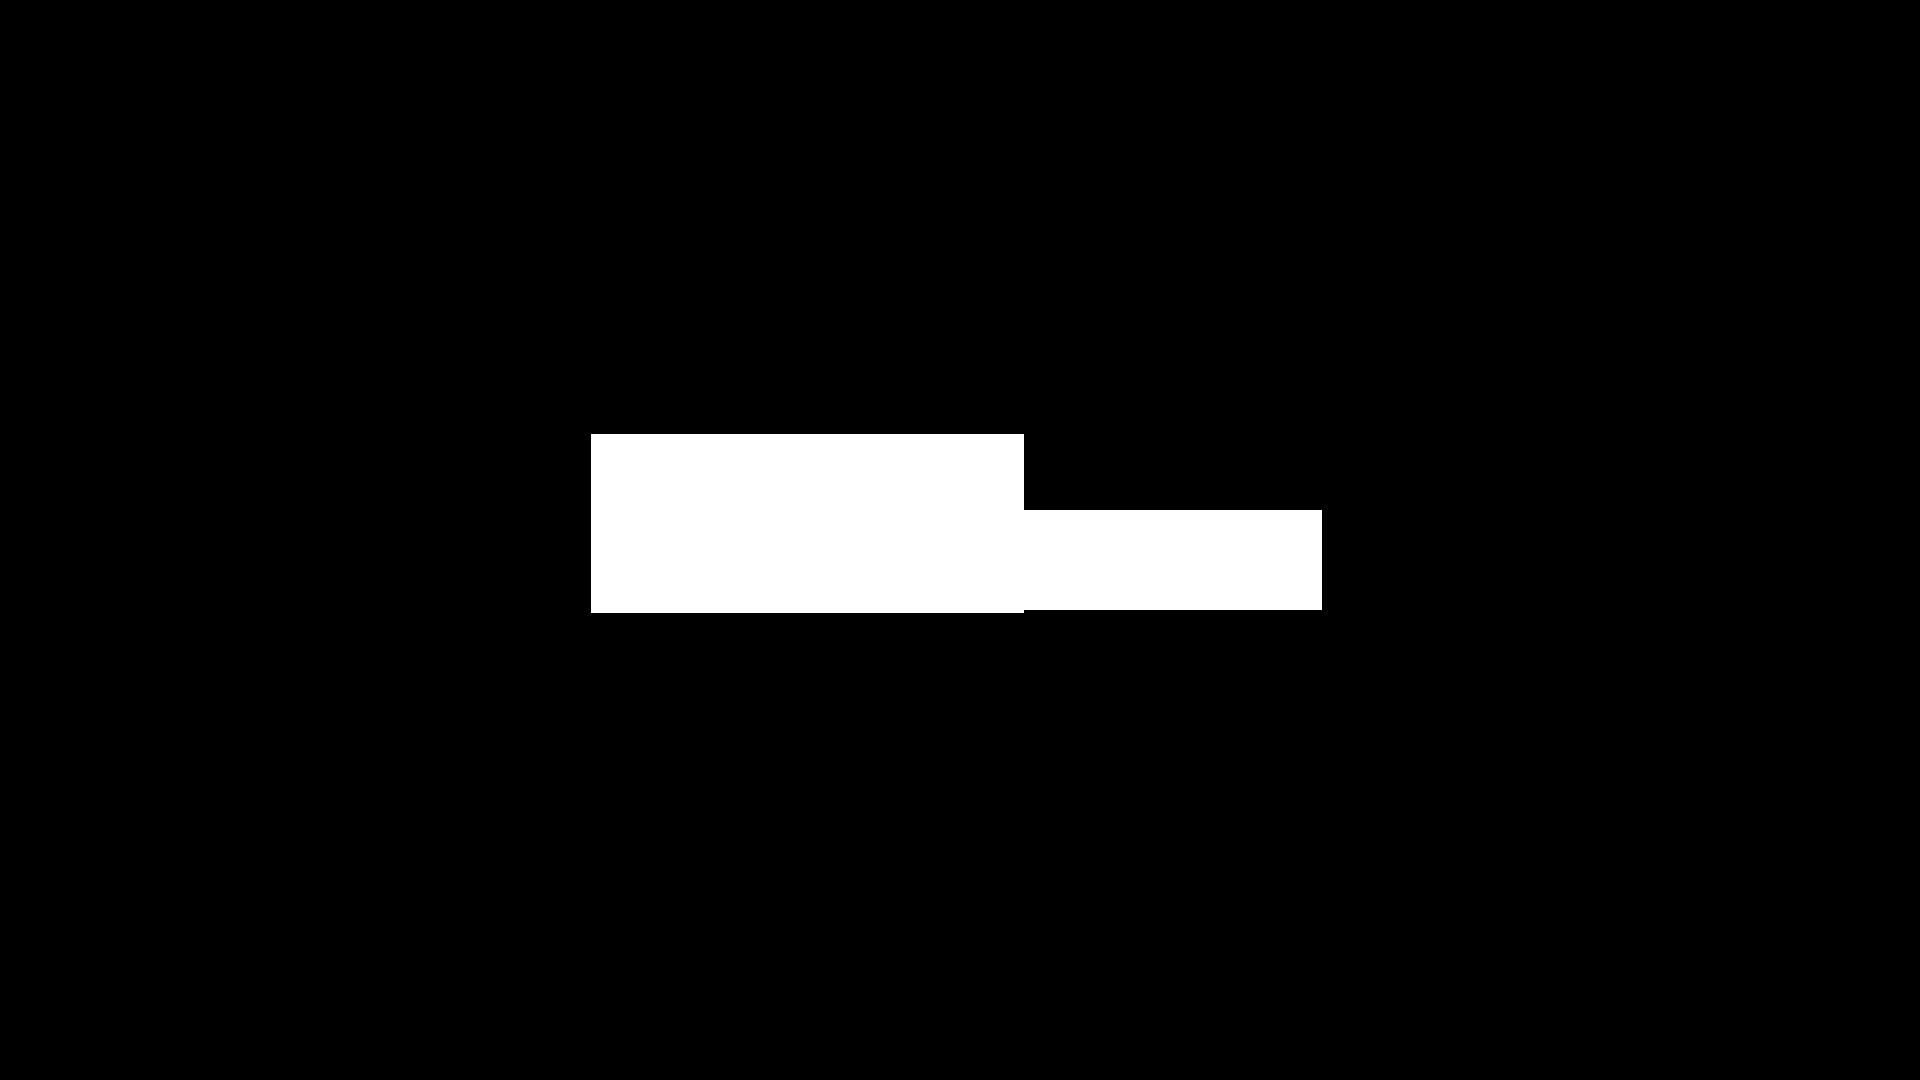 ibanez logo transp